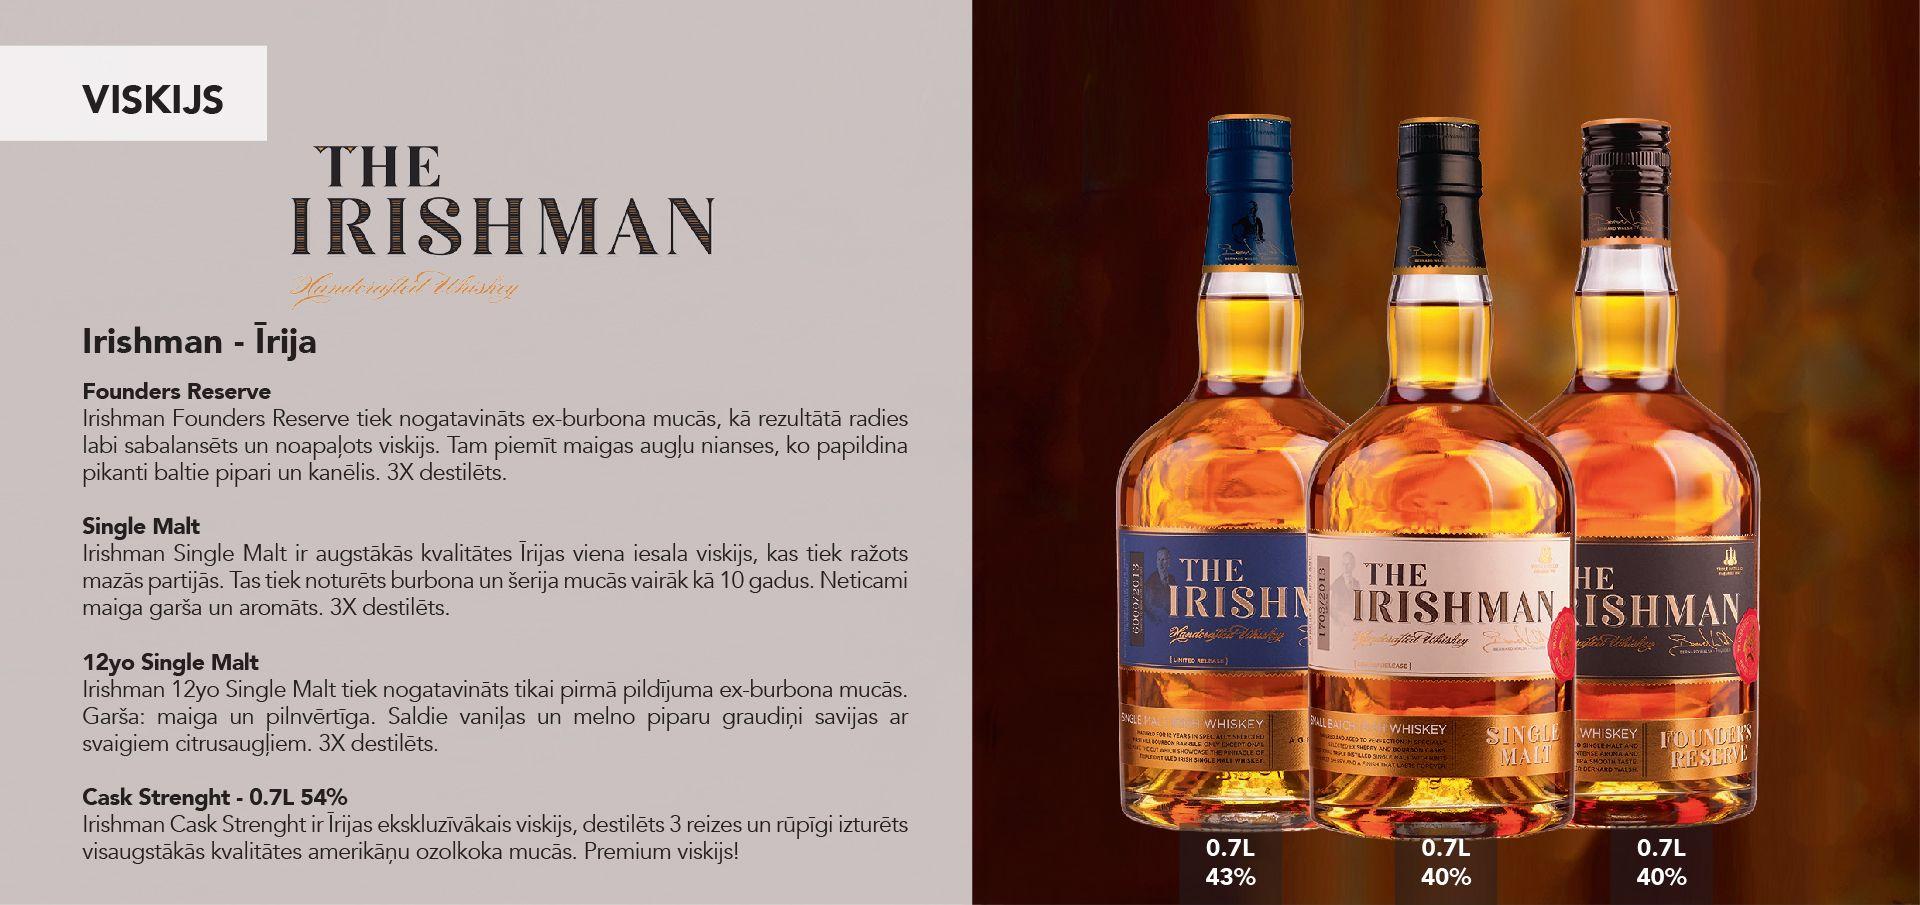 Irishman Whiskey - Īrija